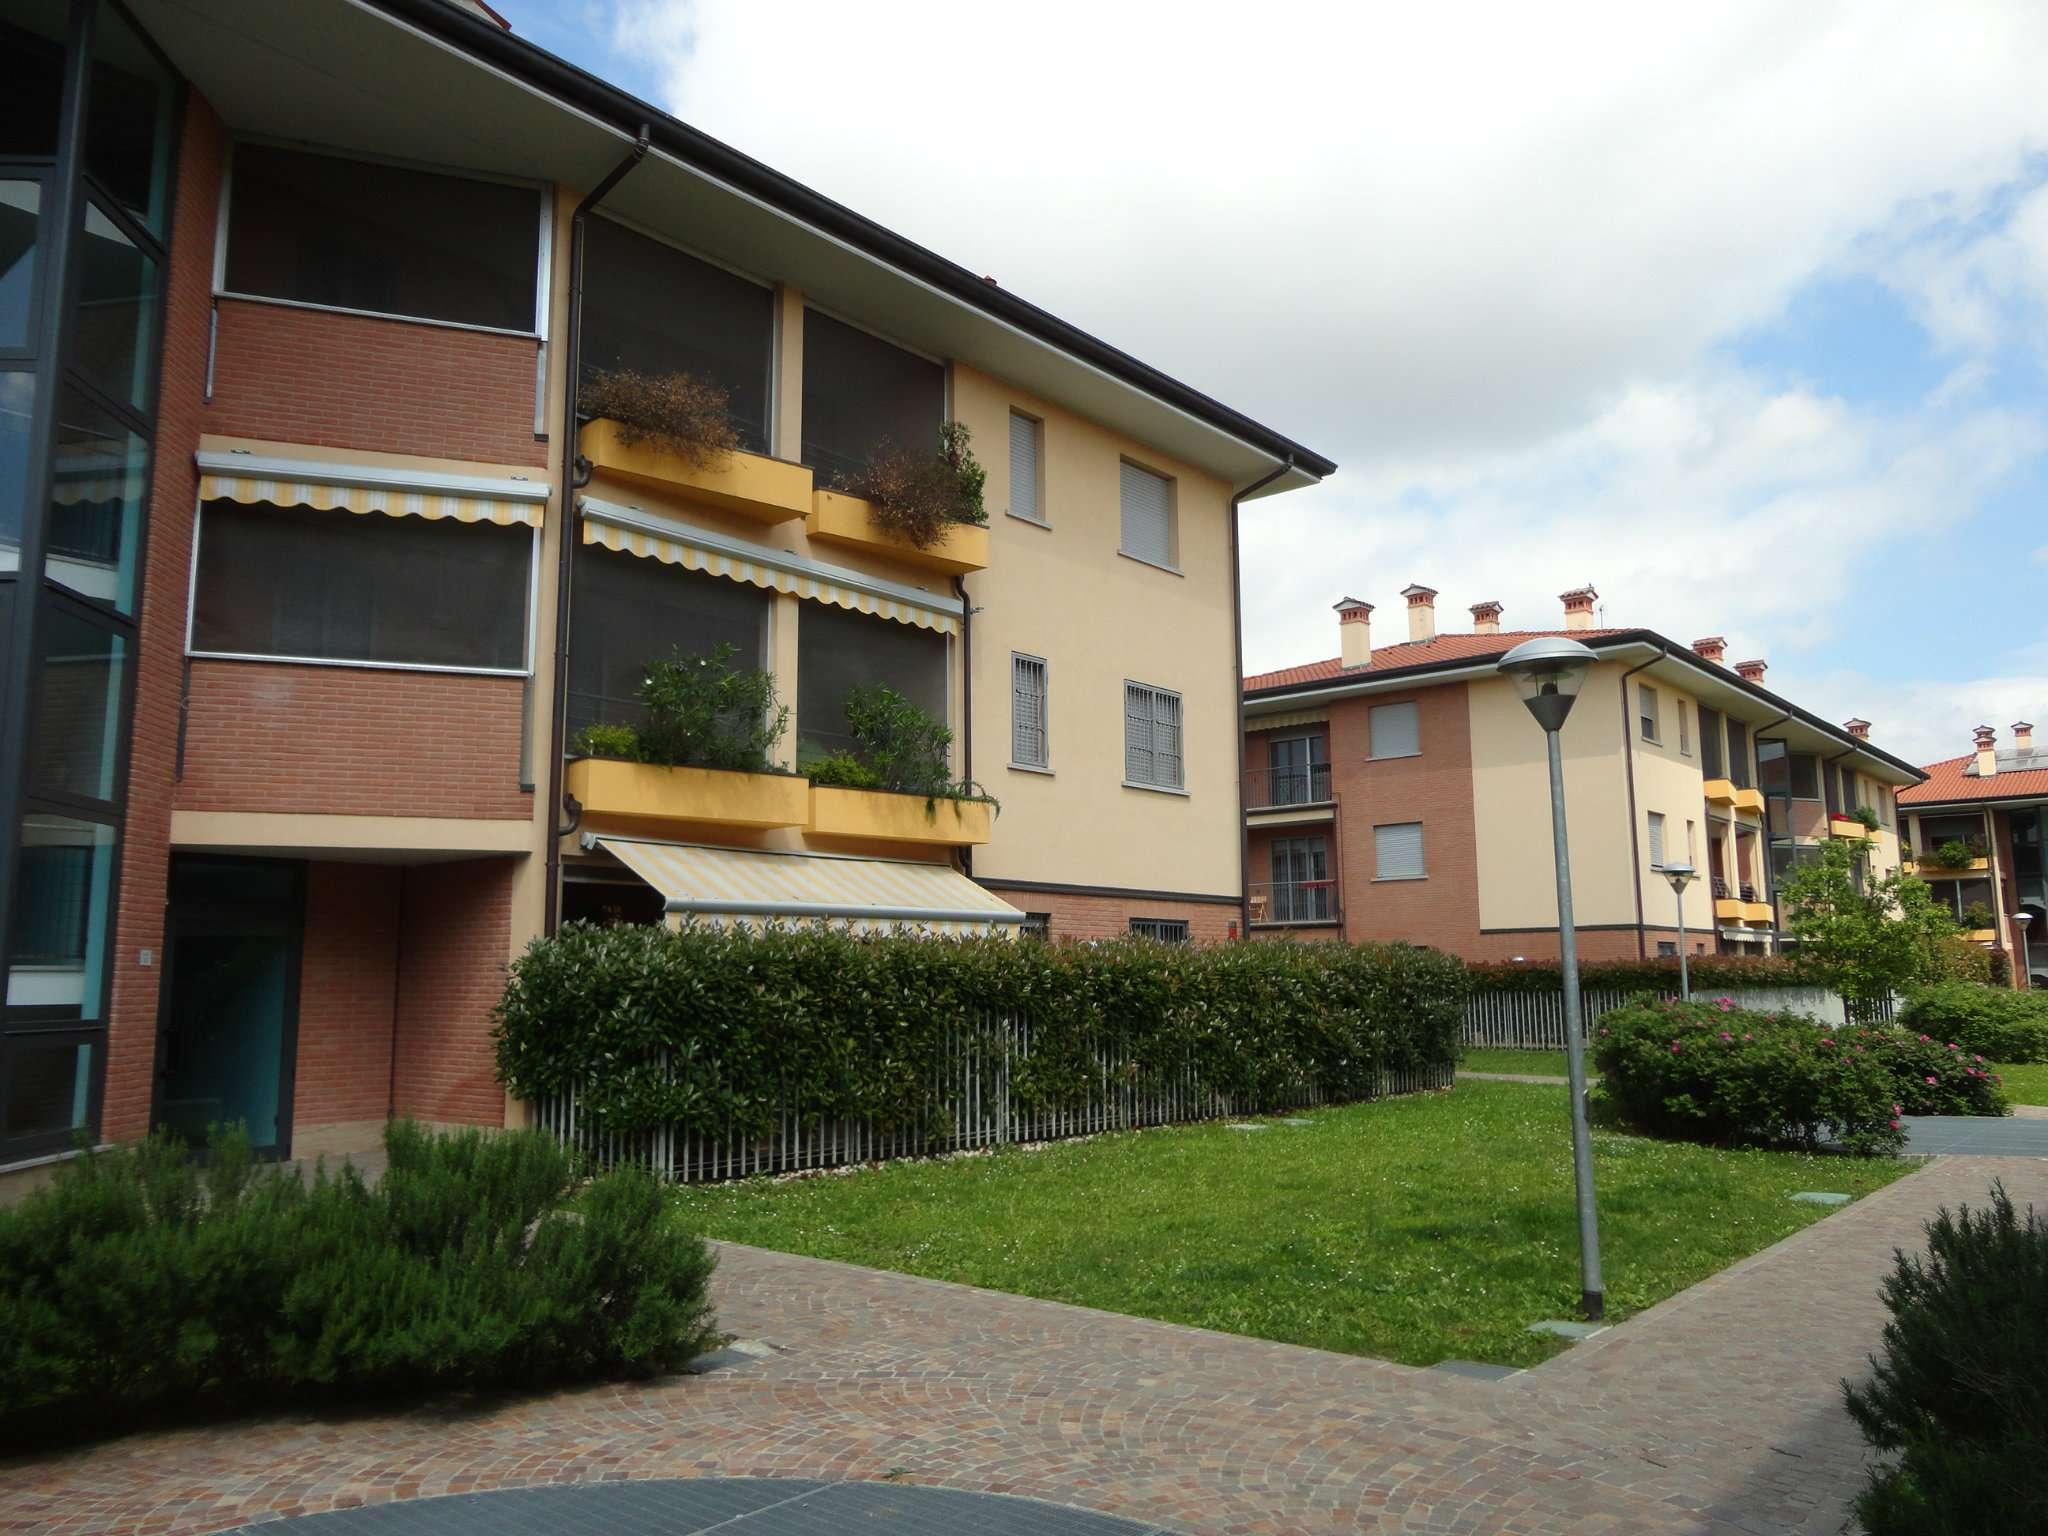 Appartamento, Via Rossini, 0, Vendita - Zibido San Giacomo